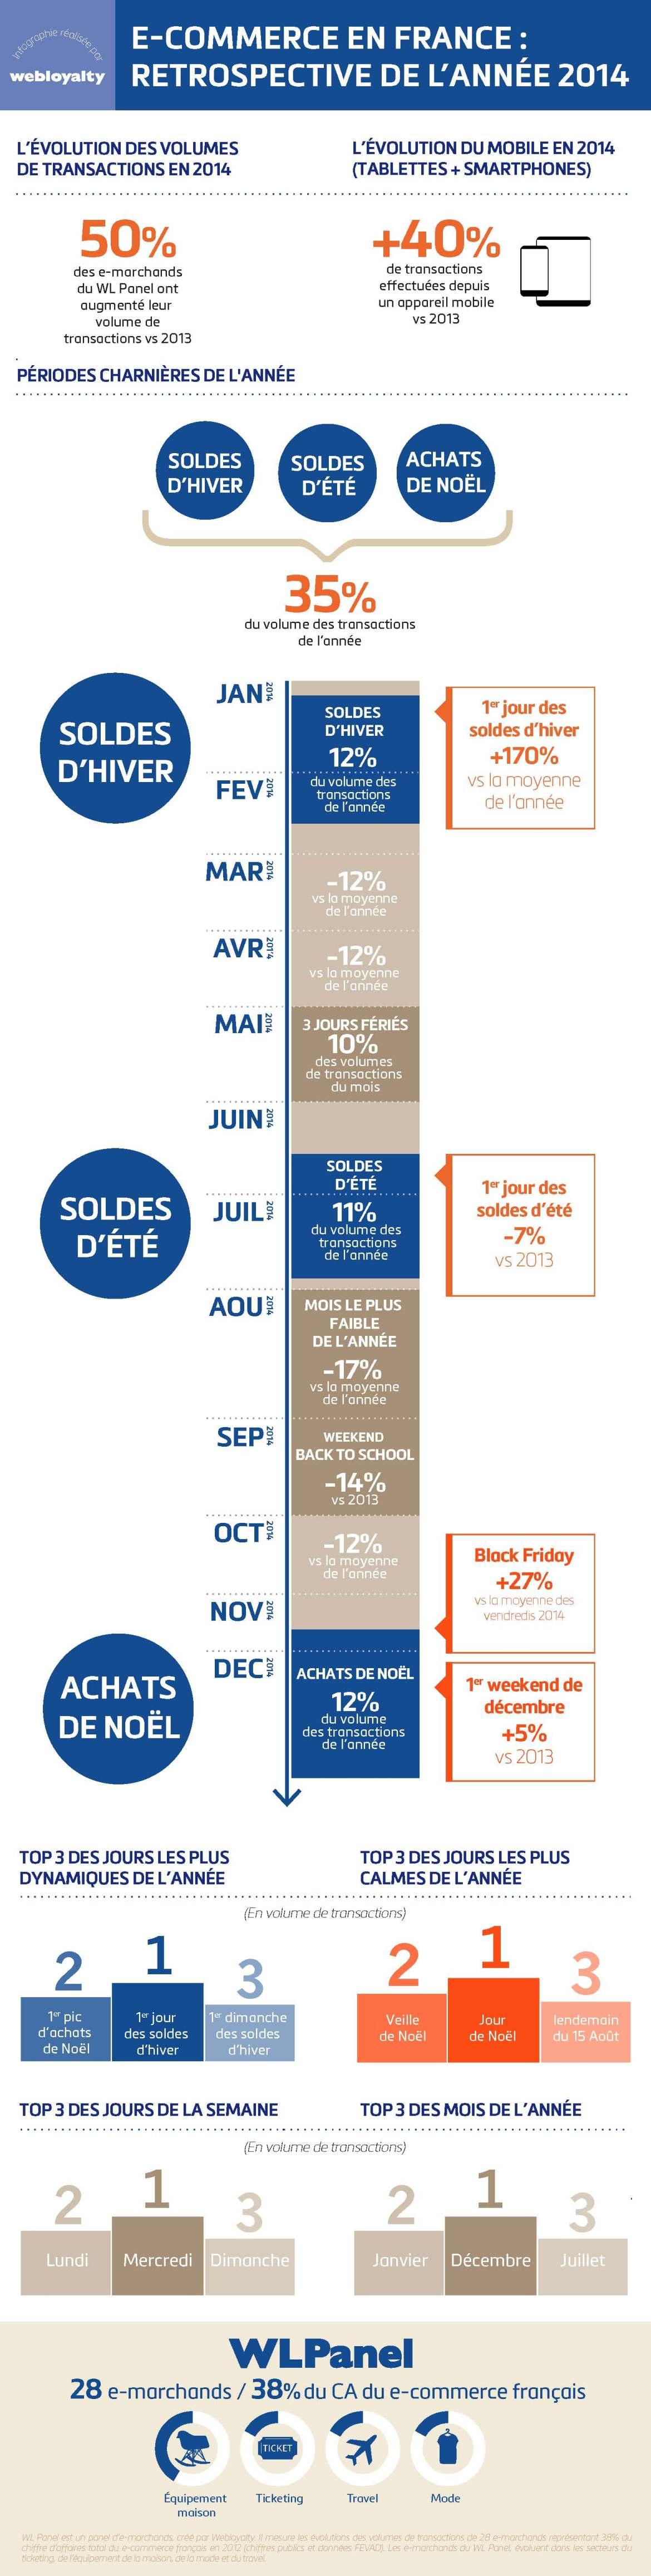 Webloyalty panel bilan du e-commerce 2014